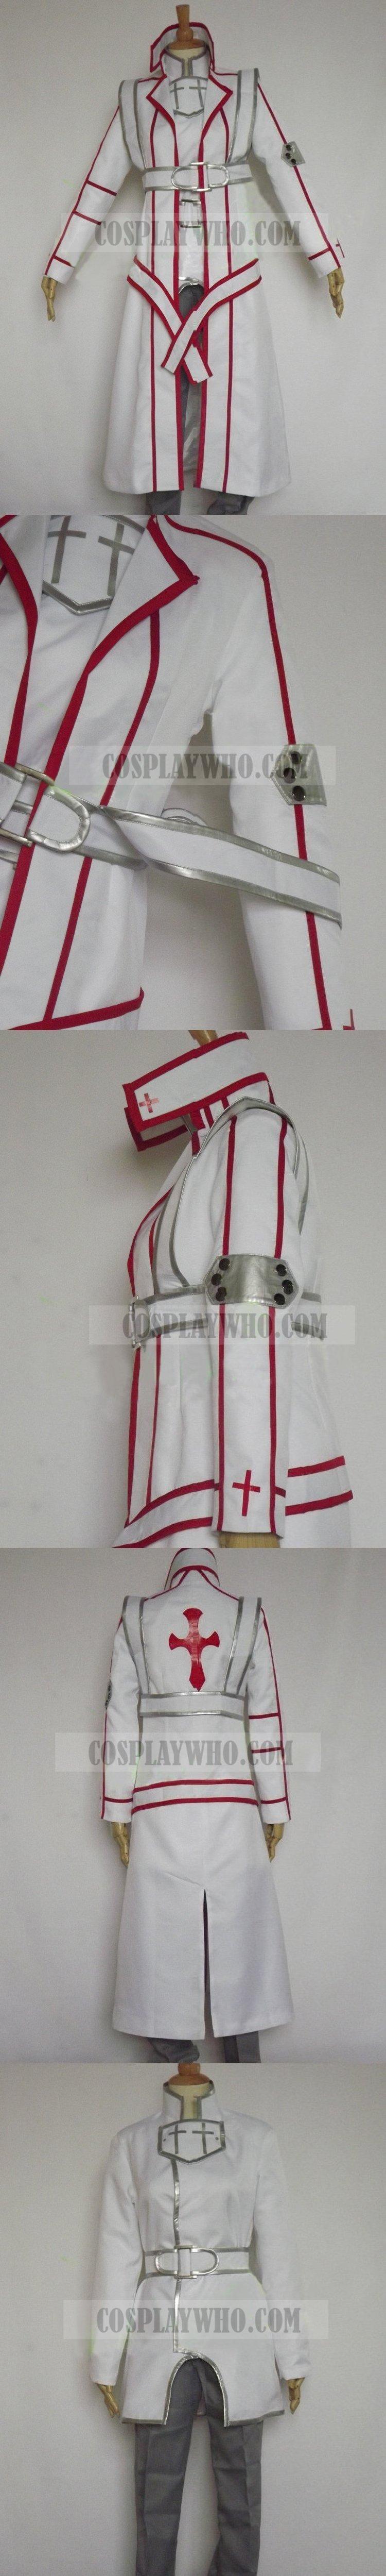 kirito knight of blood costume